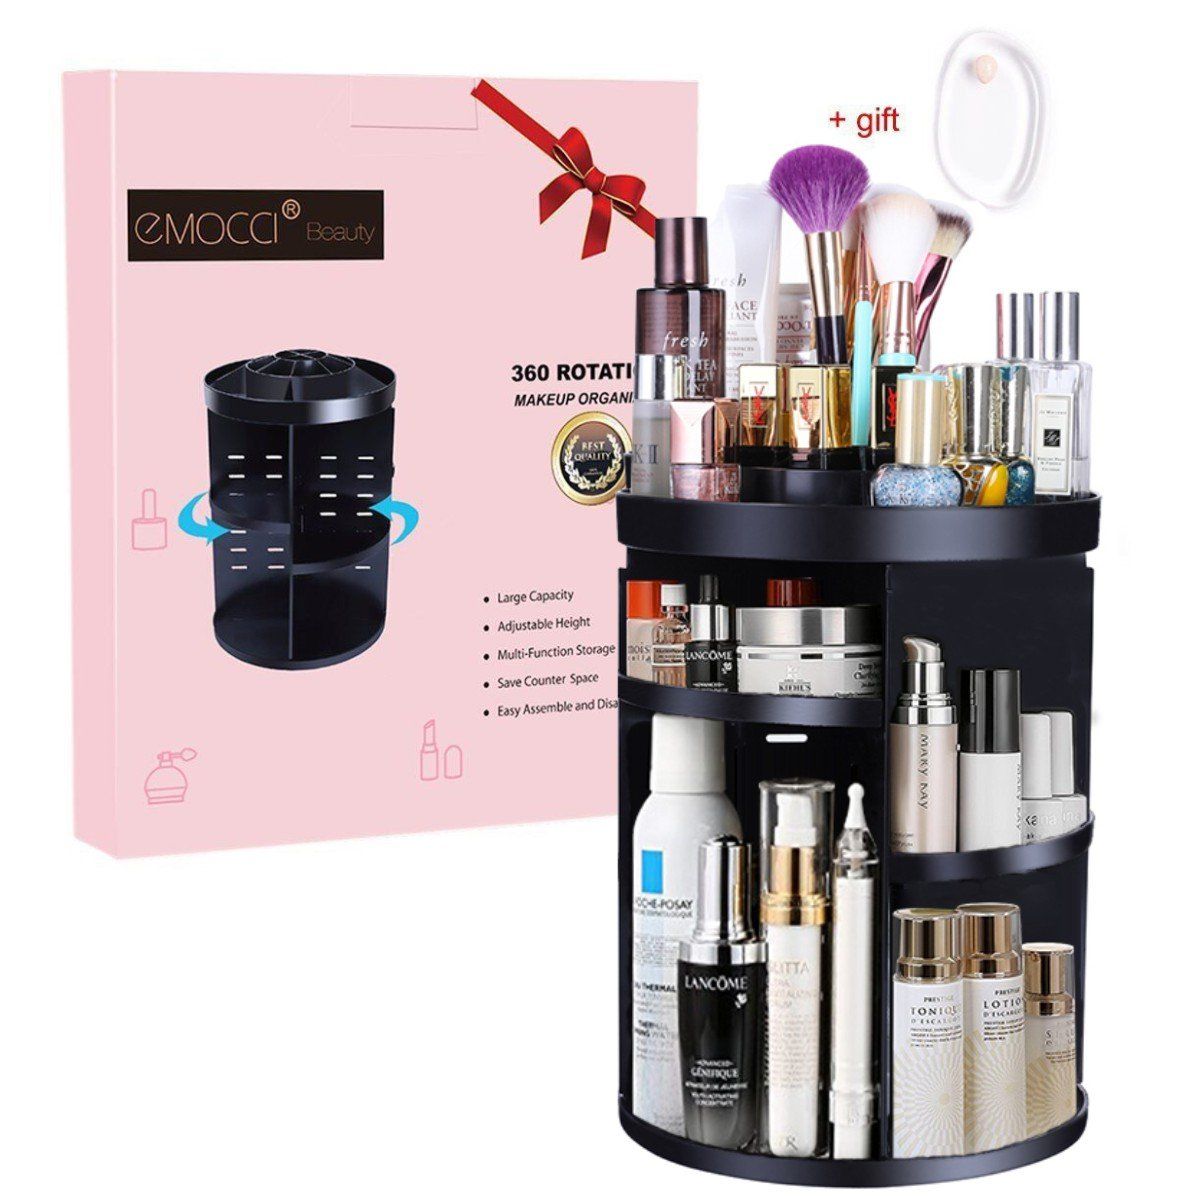 Makeup Organizers EMOCCI 360 Degree Rotating Adjustable Cosmetic Storage Box Case 7 Layers Large Capacity Make Up Holder Vanity Shelf Fits Bath Counter Bathroom Accessories(Black)